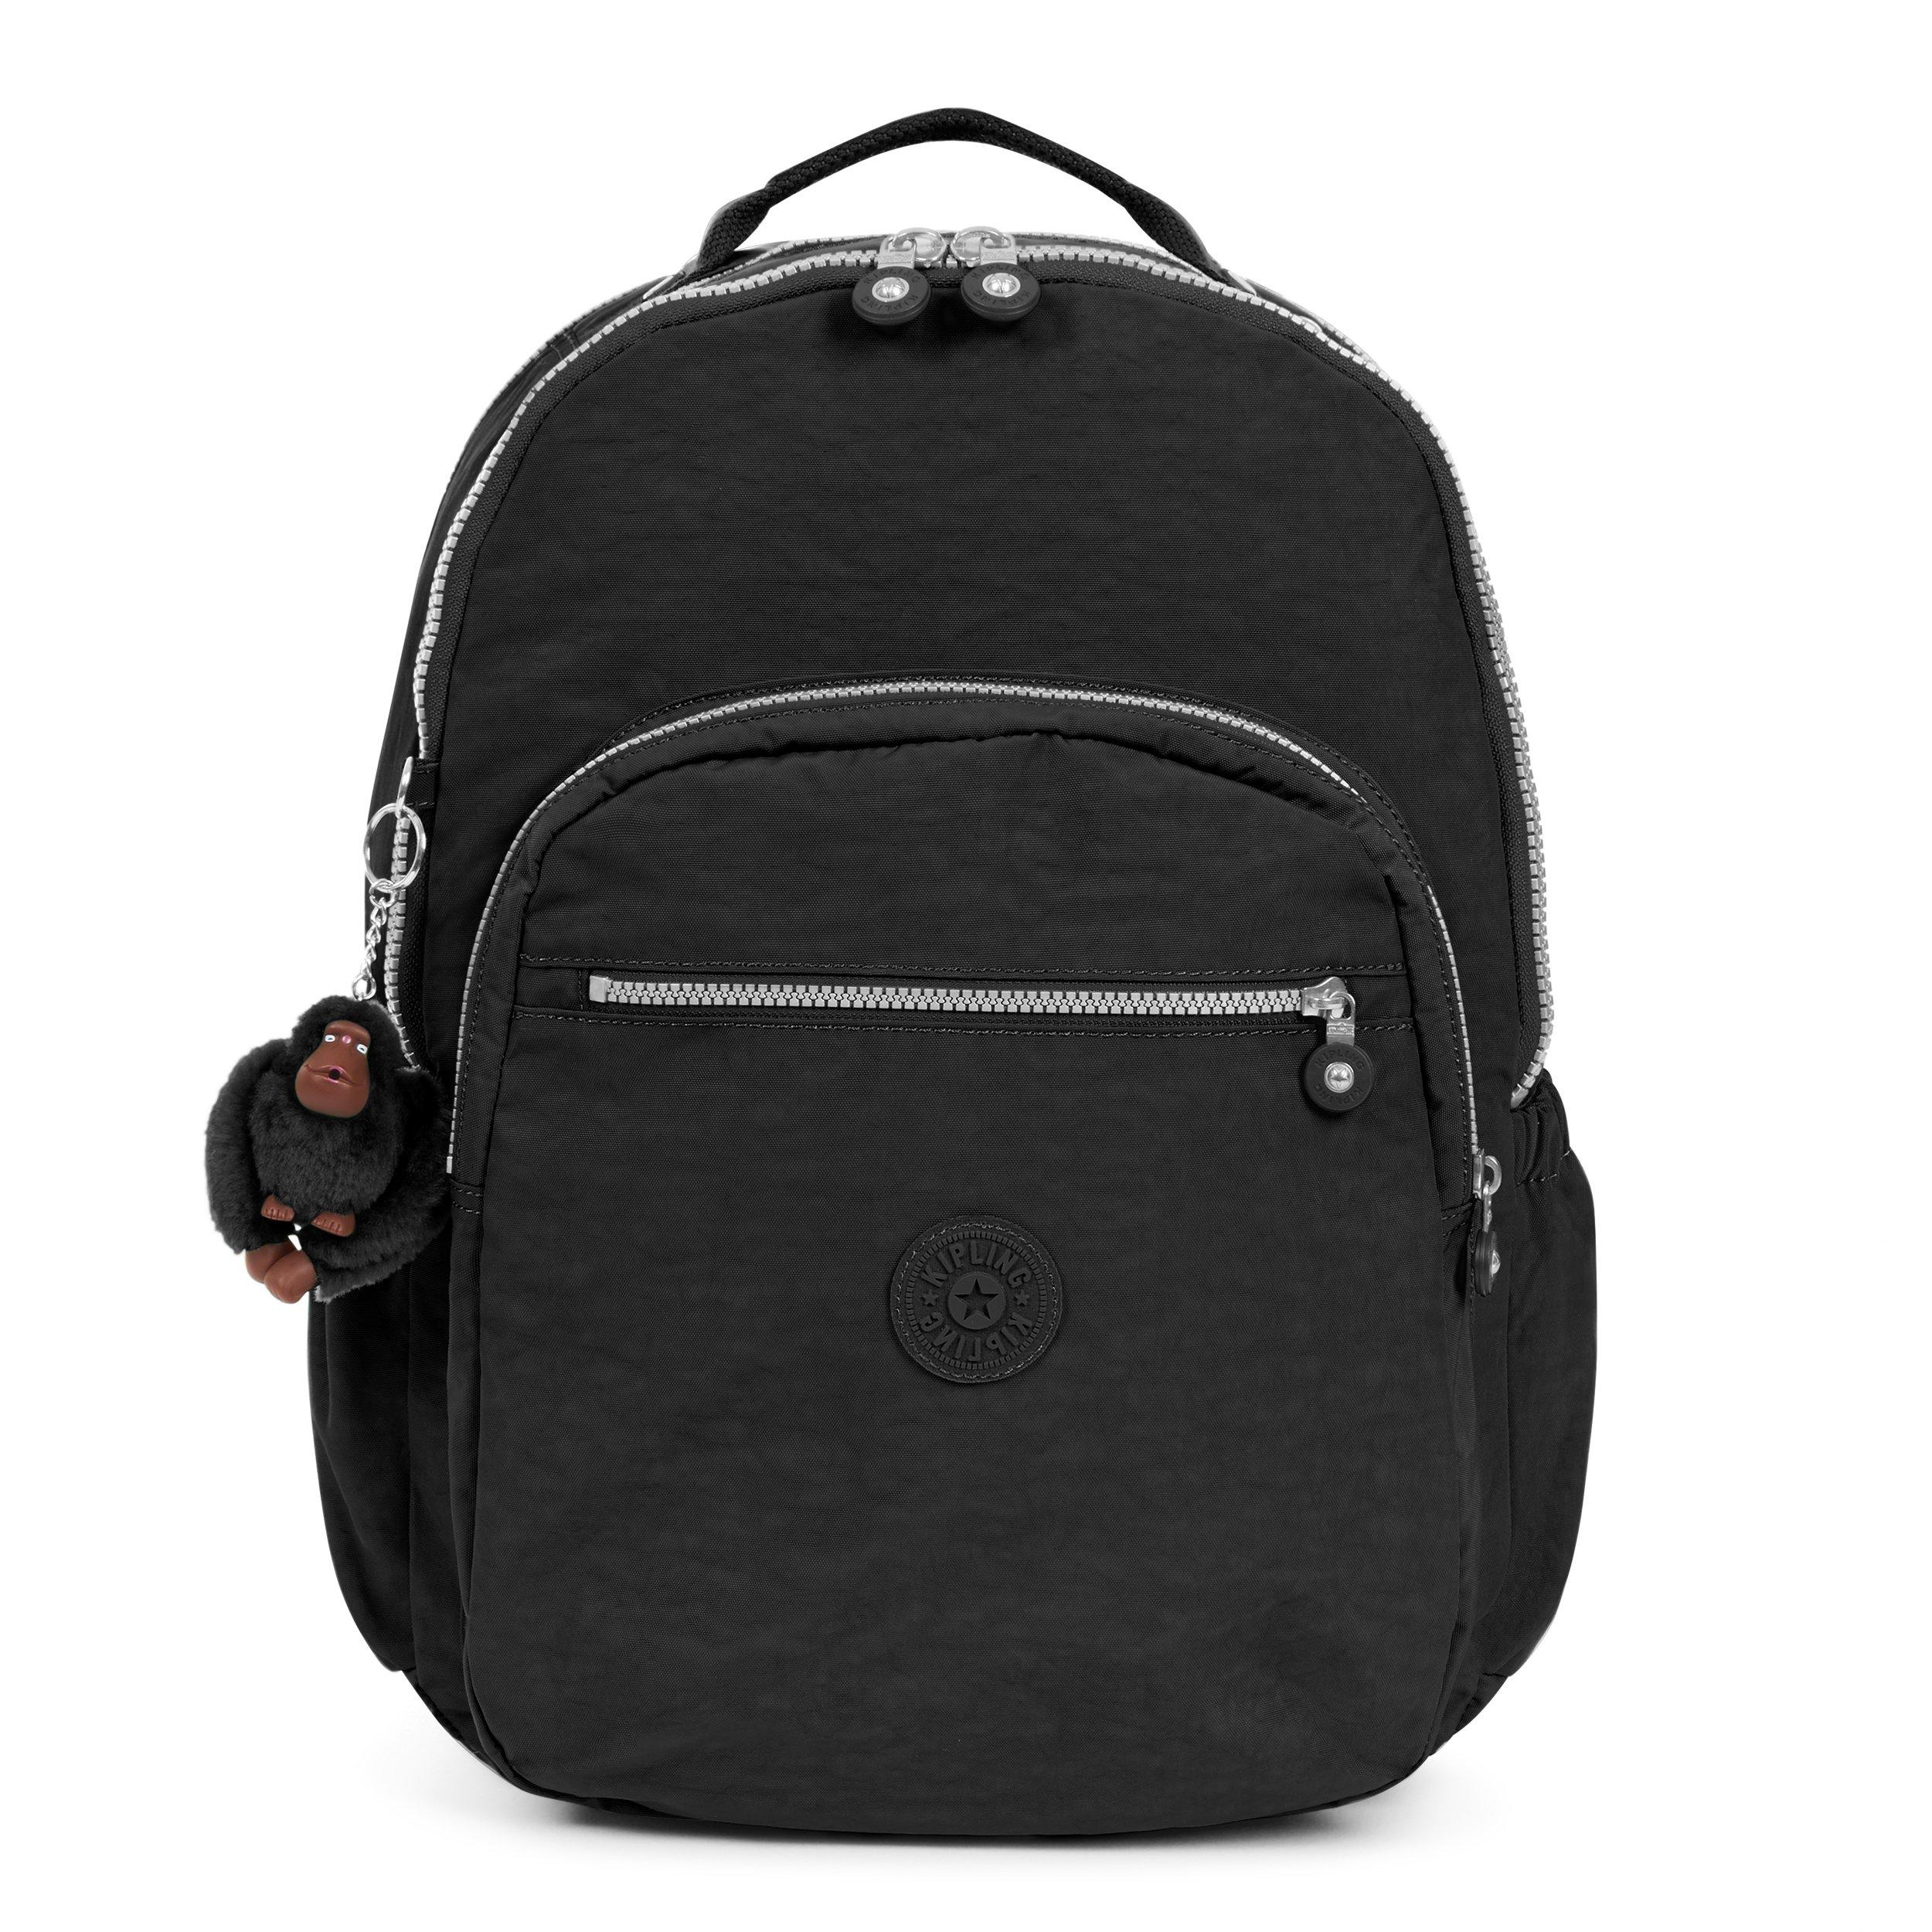 891547491 Kipling Seoul Go Laptop, Padded, Adjustable Backpack Straps, Zip Closure